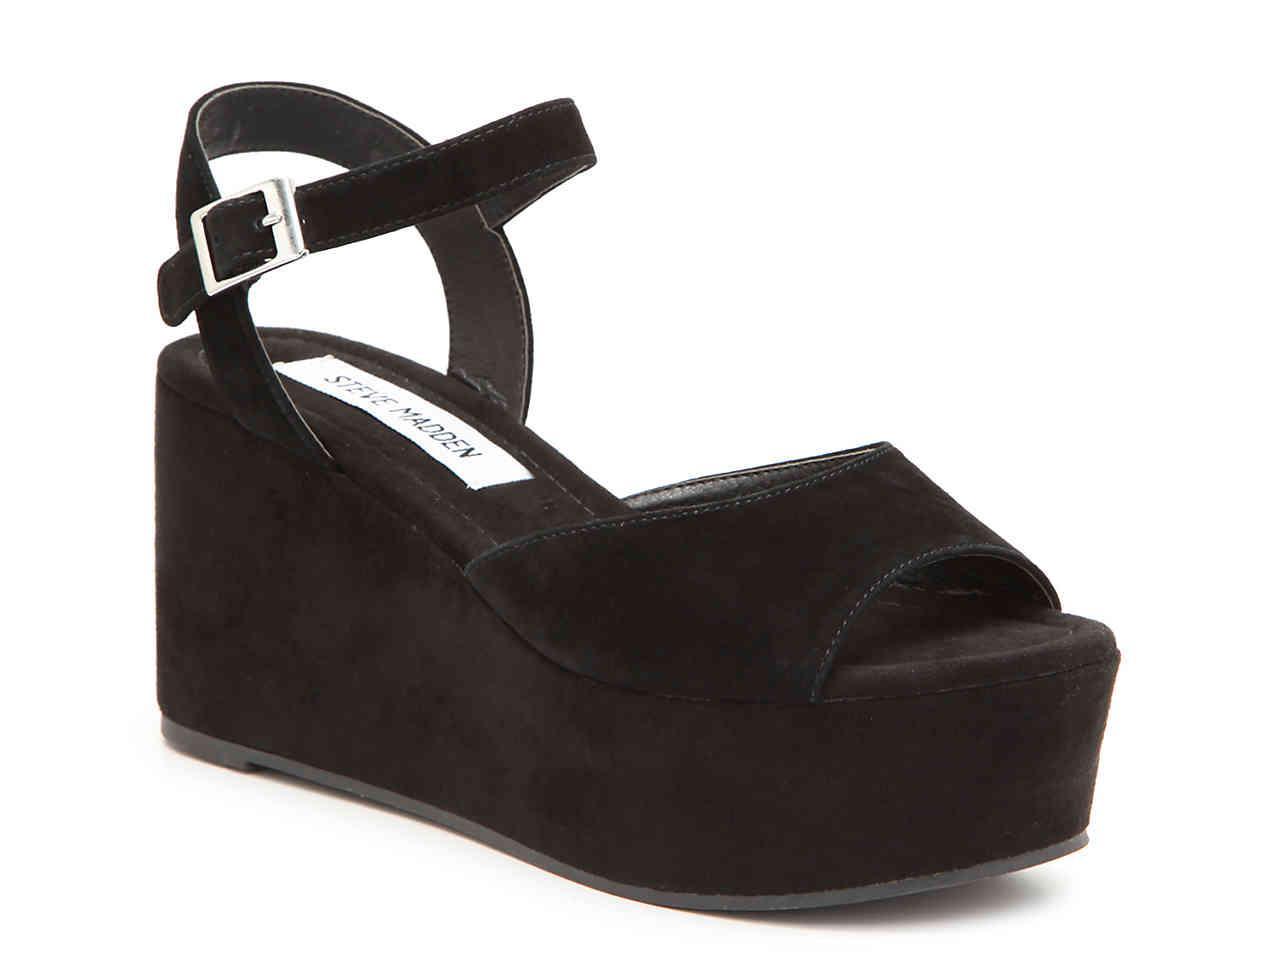 307c5f8a498 Lyst - Steve Madden Myla Platform Sandal in Black